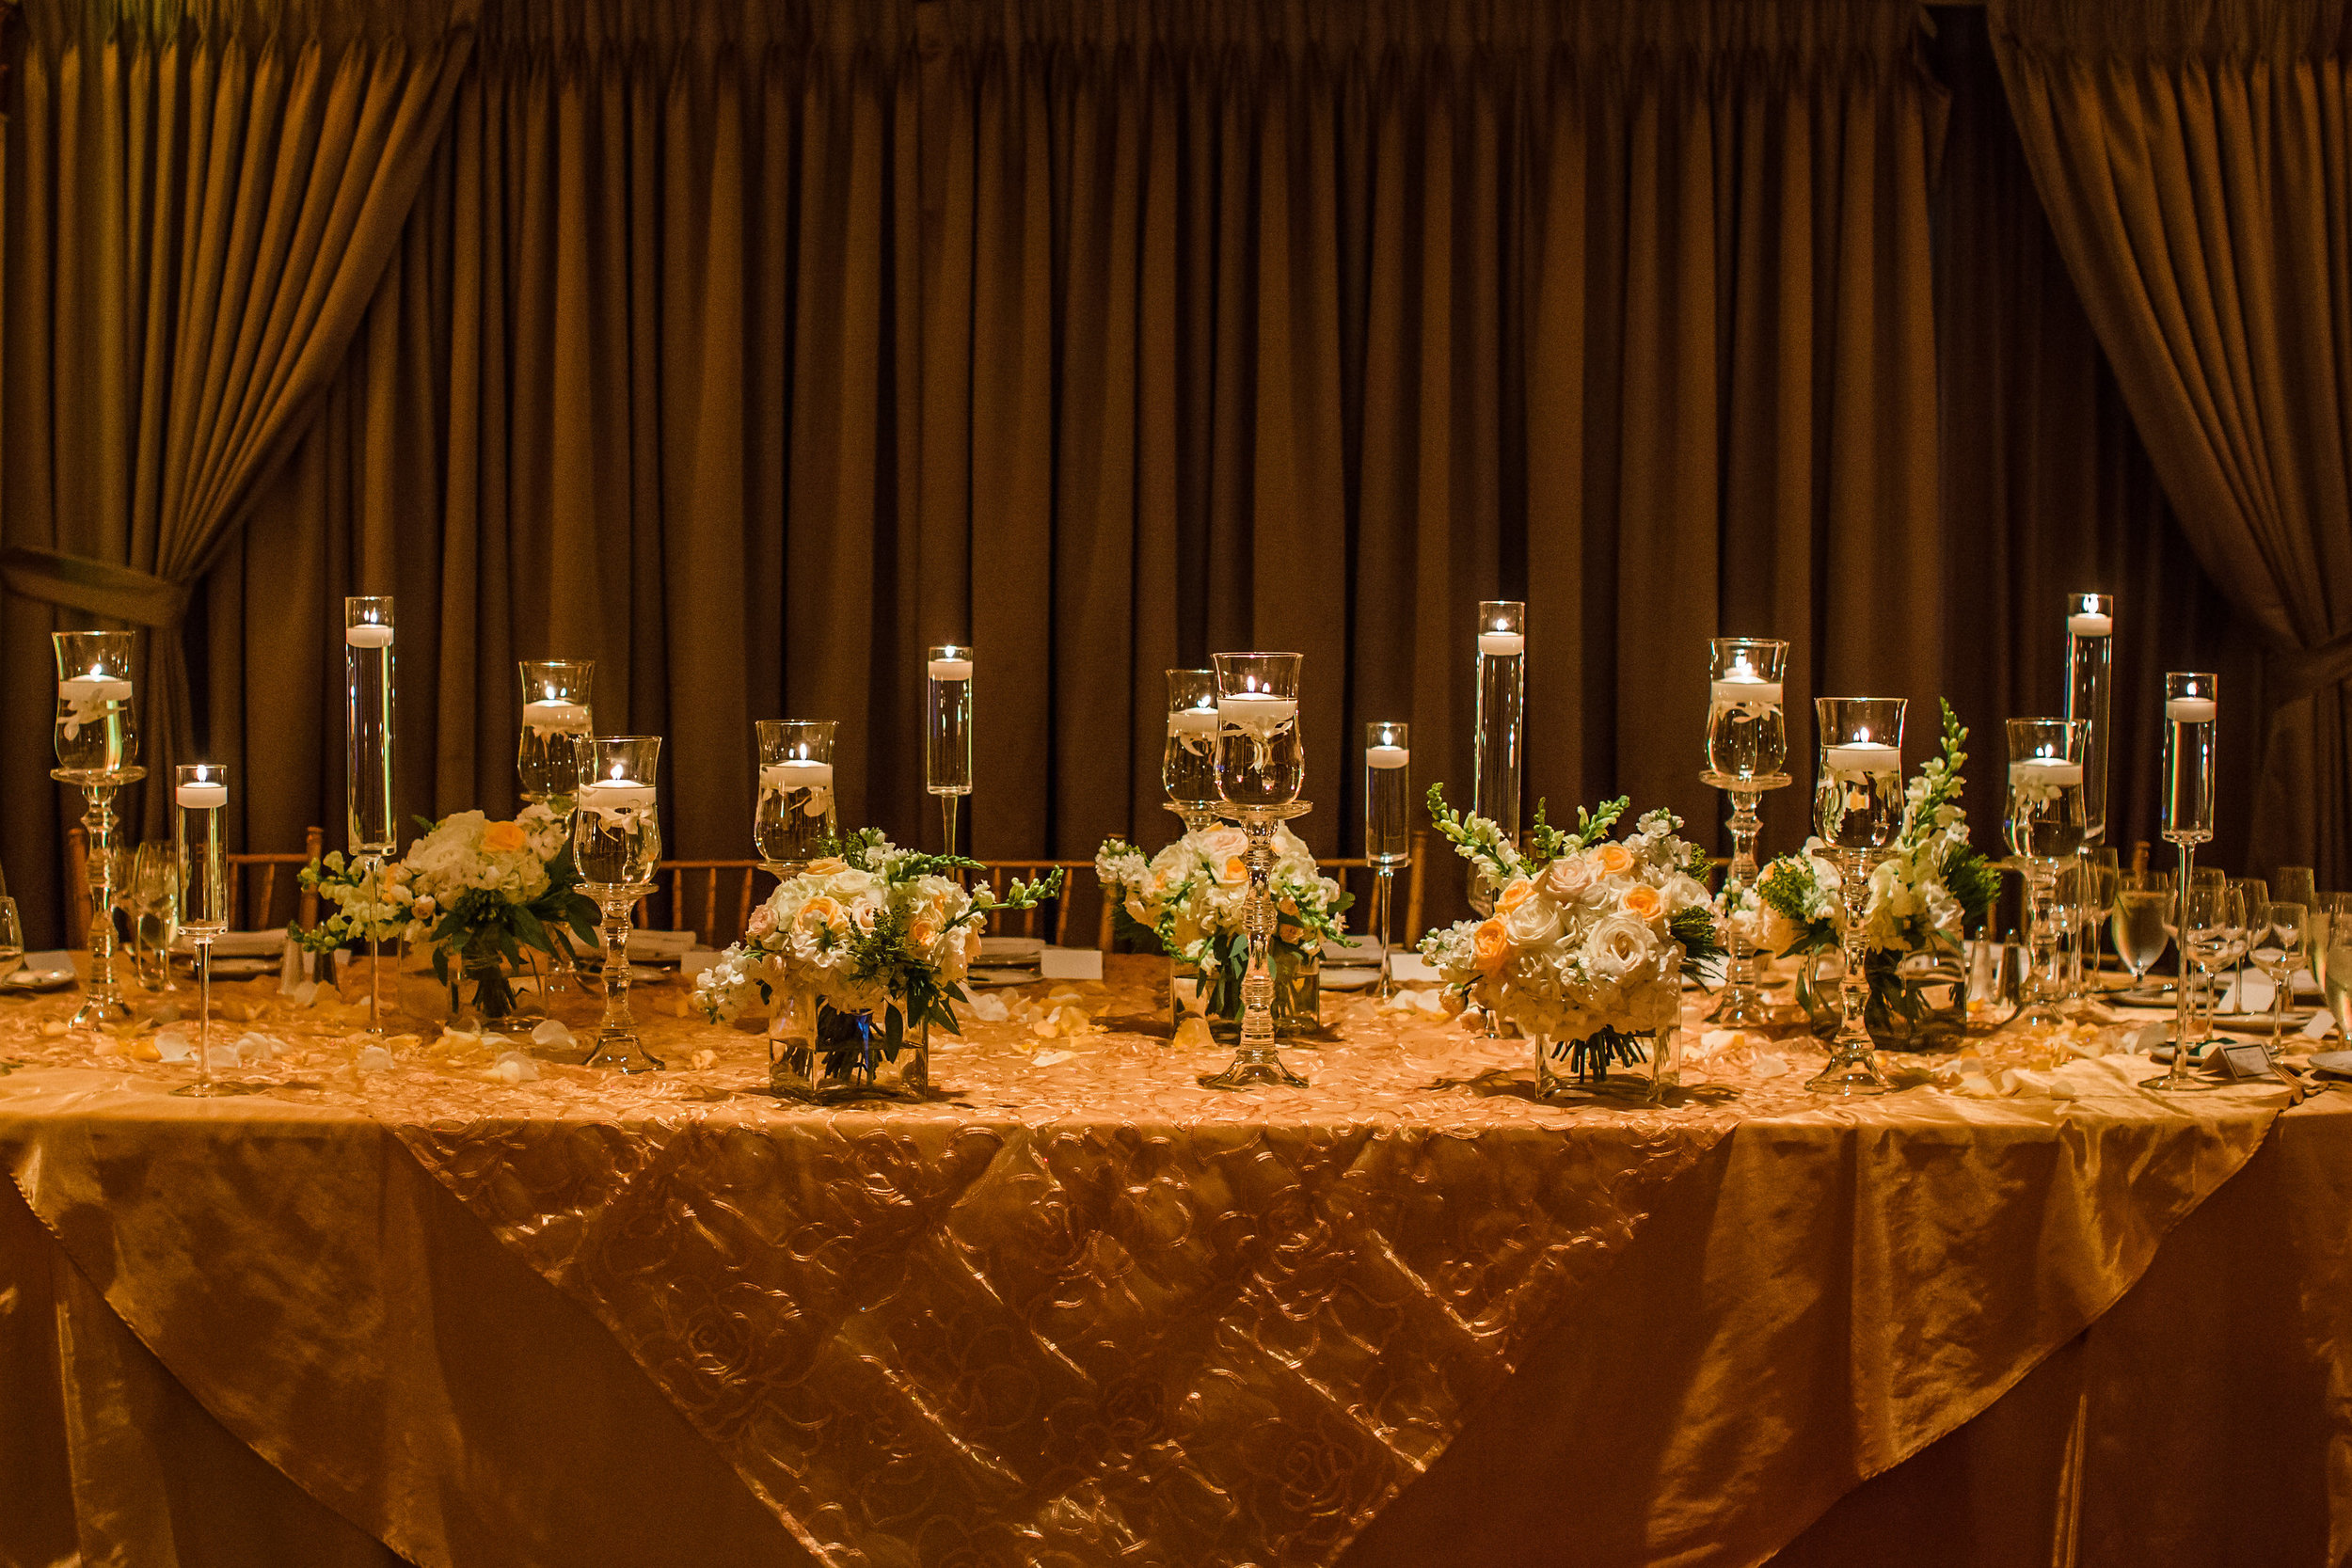 Vendors:Photographer: Juancho SC Photography   Venue : The Drake Hotel – Grand Ballroom   Wedding Coordinator: Elisa – The Simply Elegant Group   Flowers: Yanni Design Studio   Hair + Makeup:  Pin Me Up   Makeup Artist: Glam'D   Dj and MC: DJ Akib  Horse: Maharaja Farm   Officiant: Krishna Sulakhe